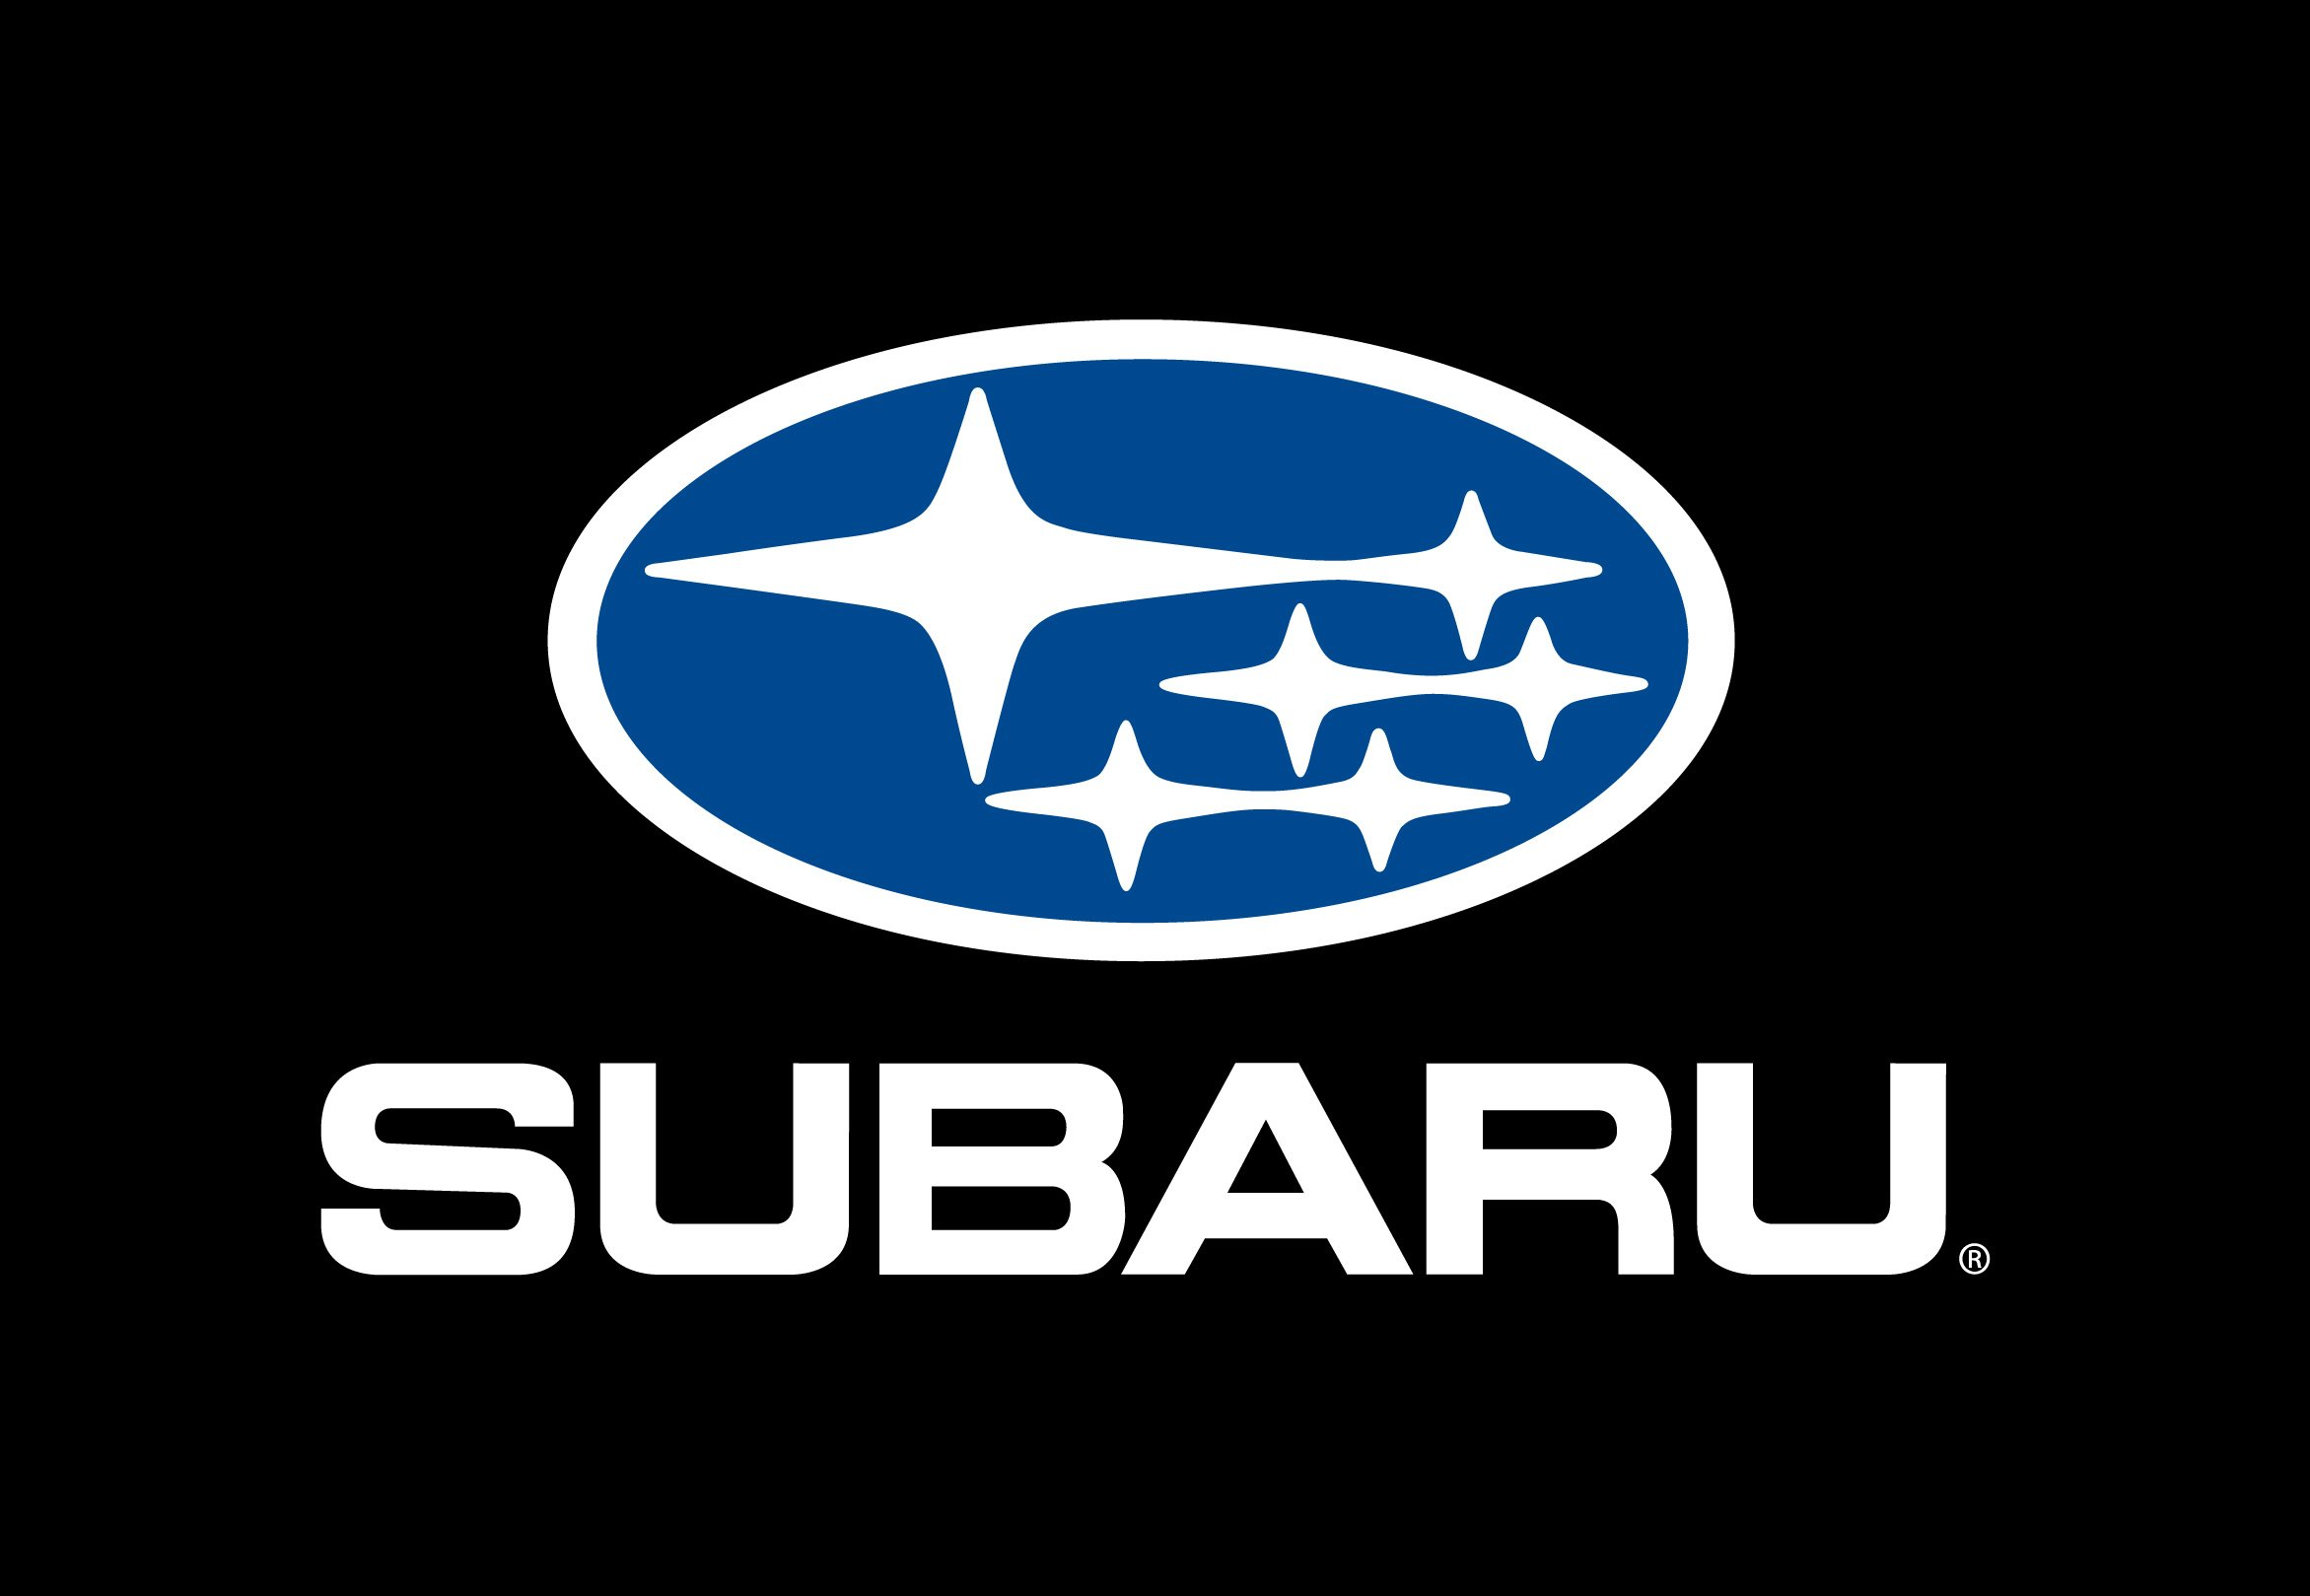 Subaru логотип